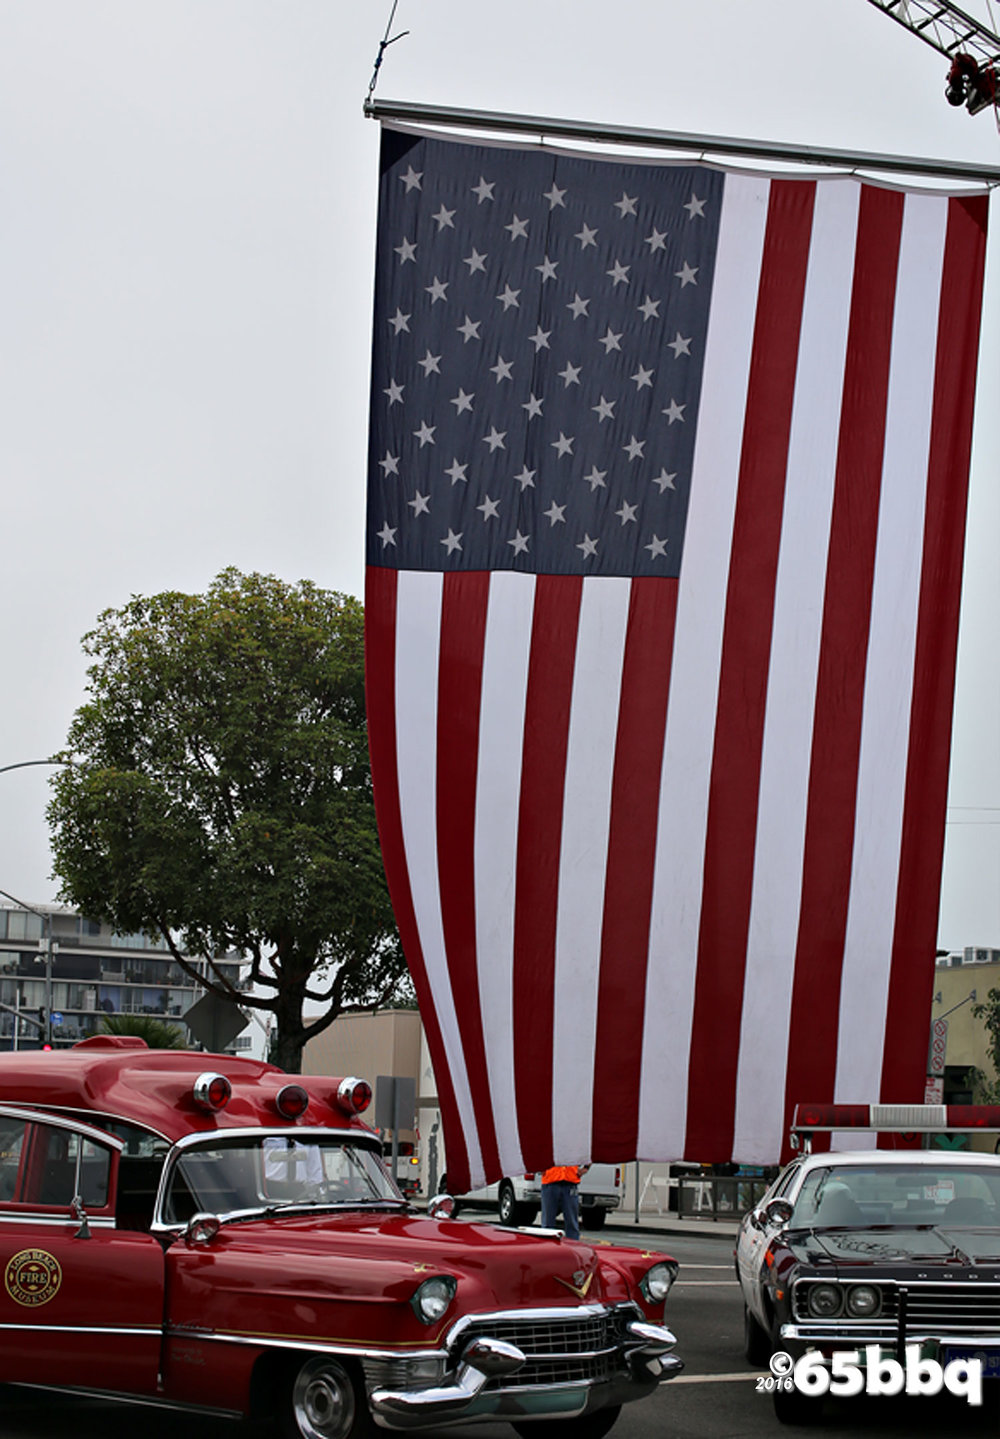 Belmont Flag 65bbq